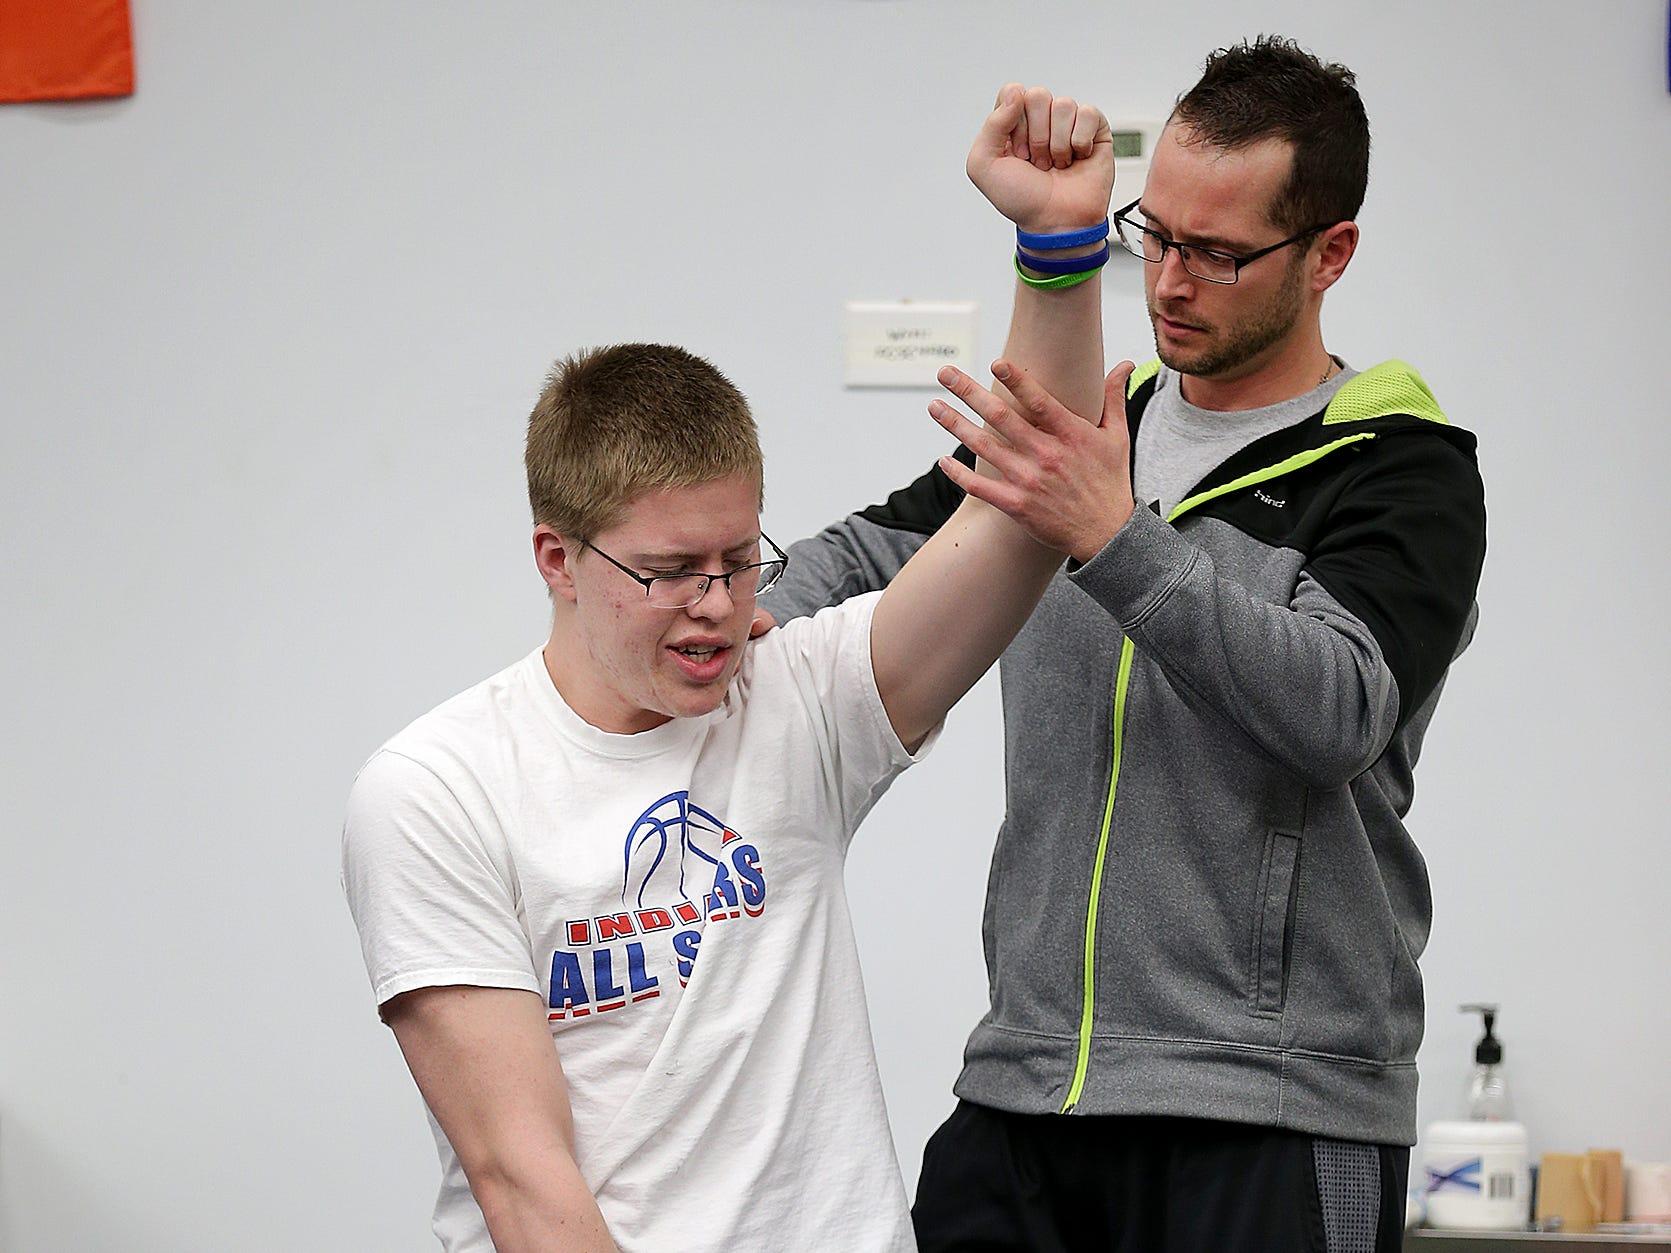 Columbus North basketball star Josh Speidel works on he rehab with rehab trainer Nate Frasier at Maximum Velocity Performance in Columbus in 2016.